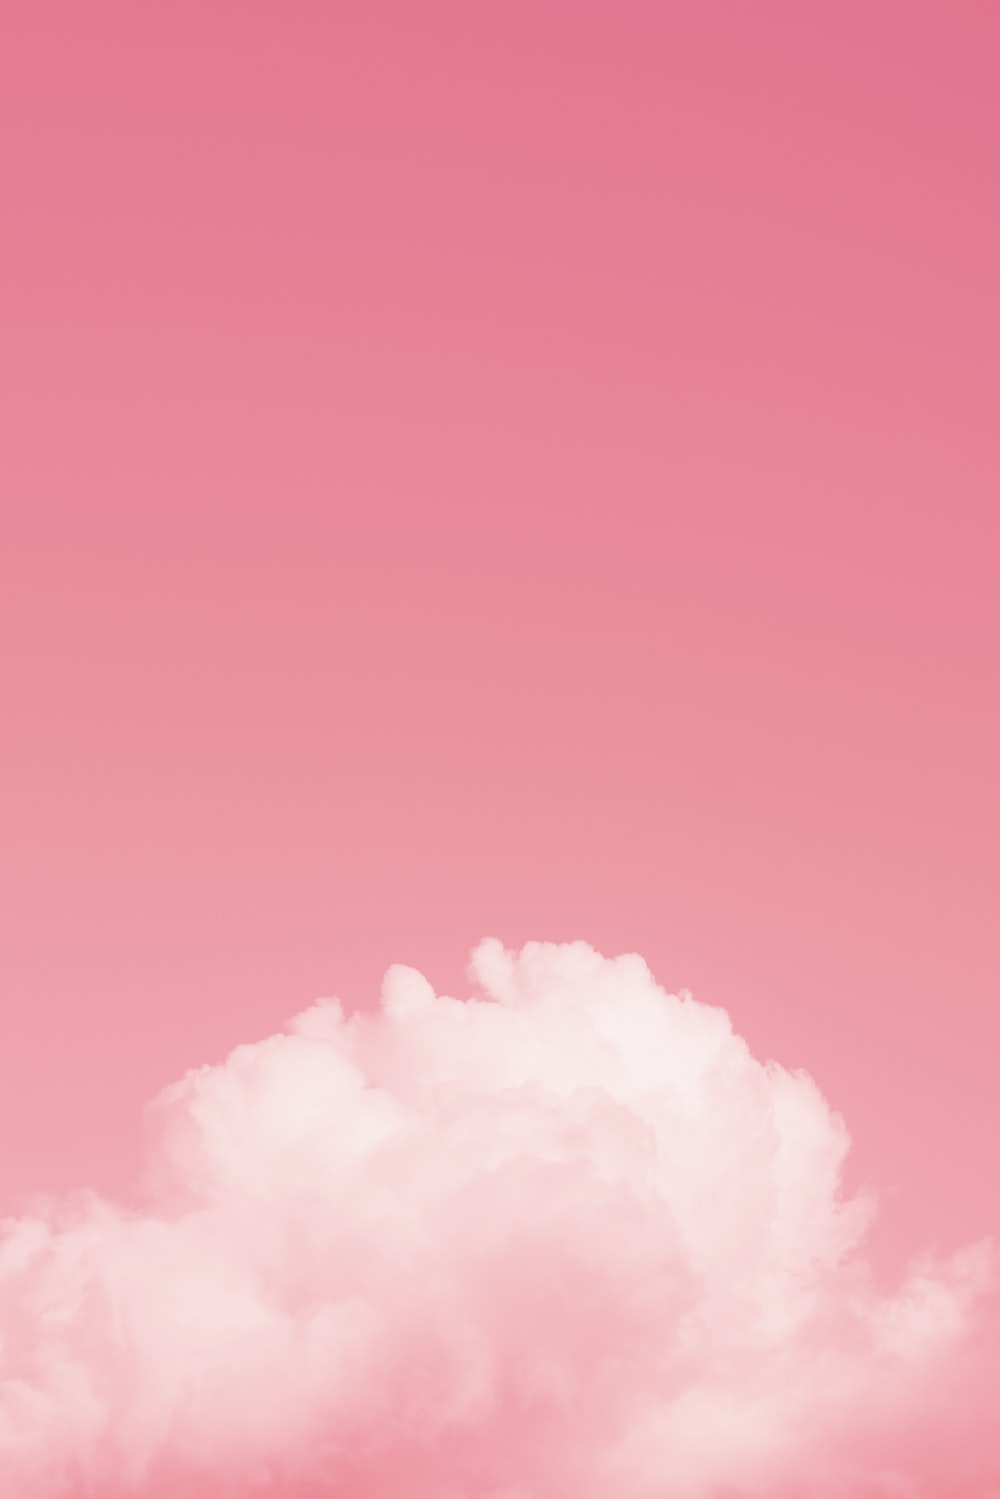 Pink Wallpapers Free HD Download [12+ HQ]   Unsplash